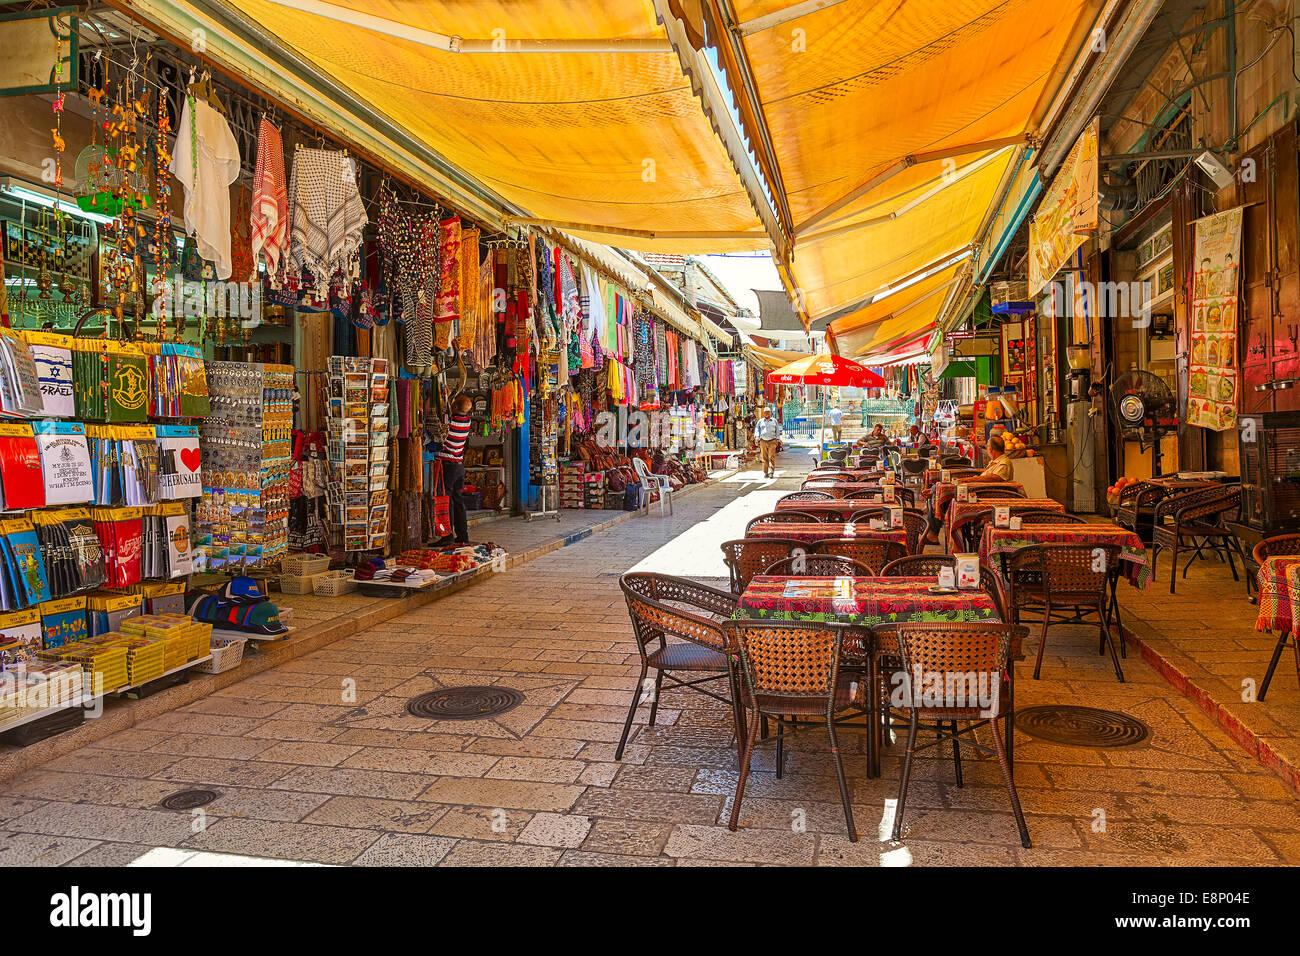 Bazaar nella Città Vecchia di Gerusalemme, Israele. Foto Stock